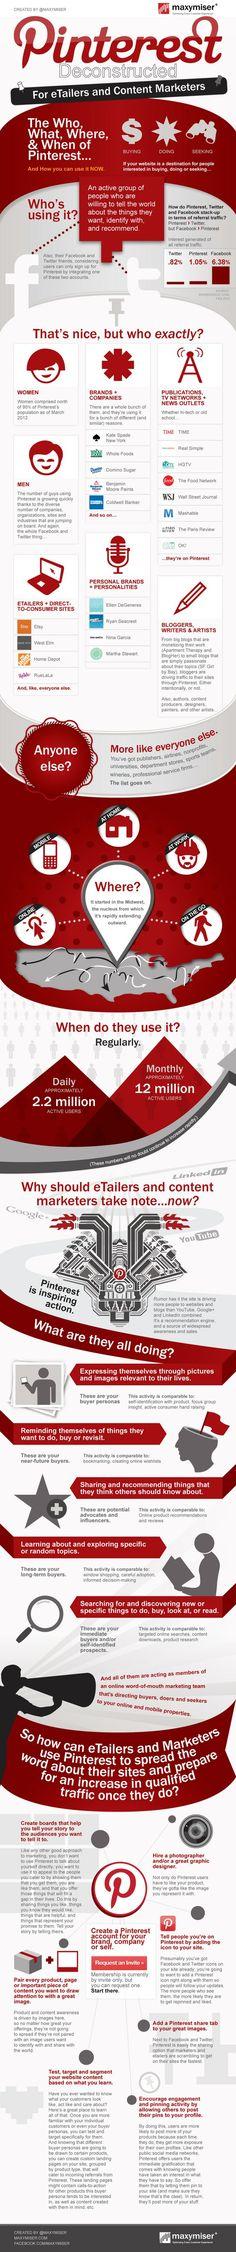 SOCIAL MEDIA  Pinterest Deconstructed Infographic...   #Education #Pinterest